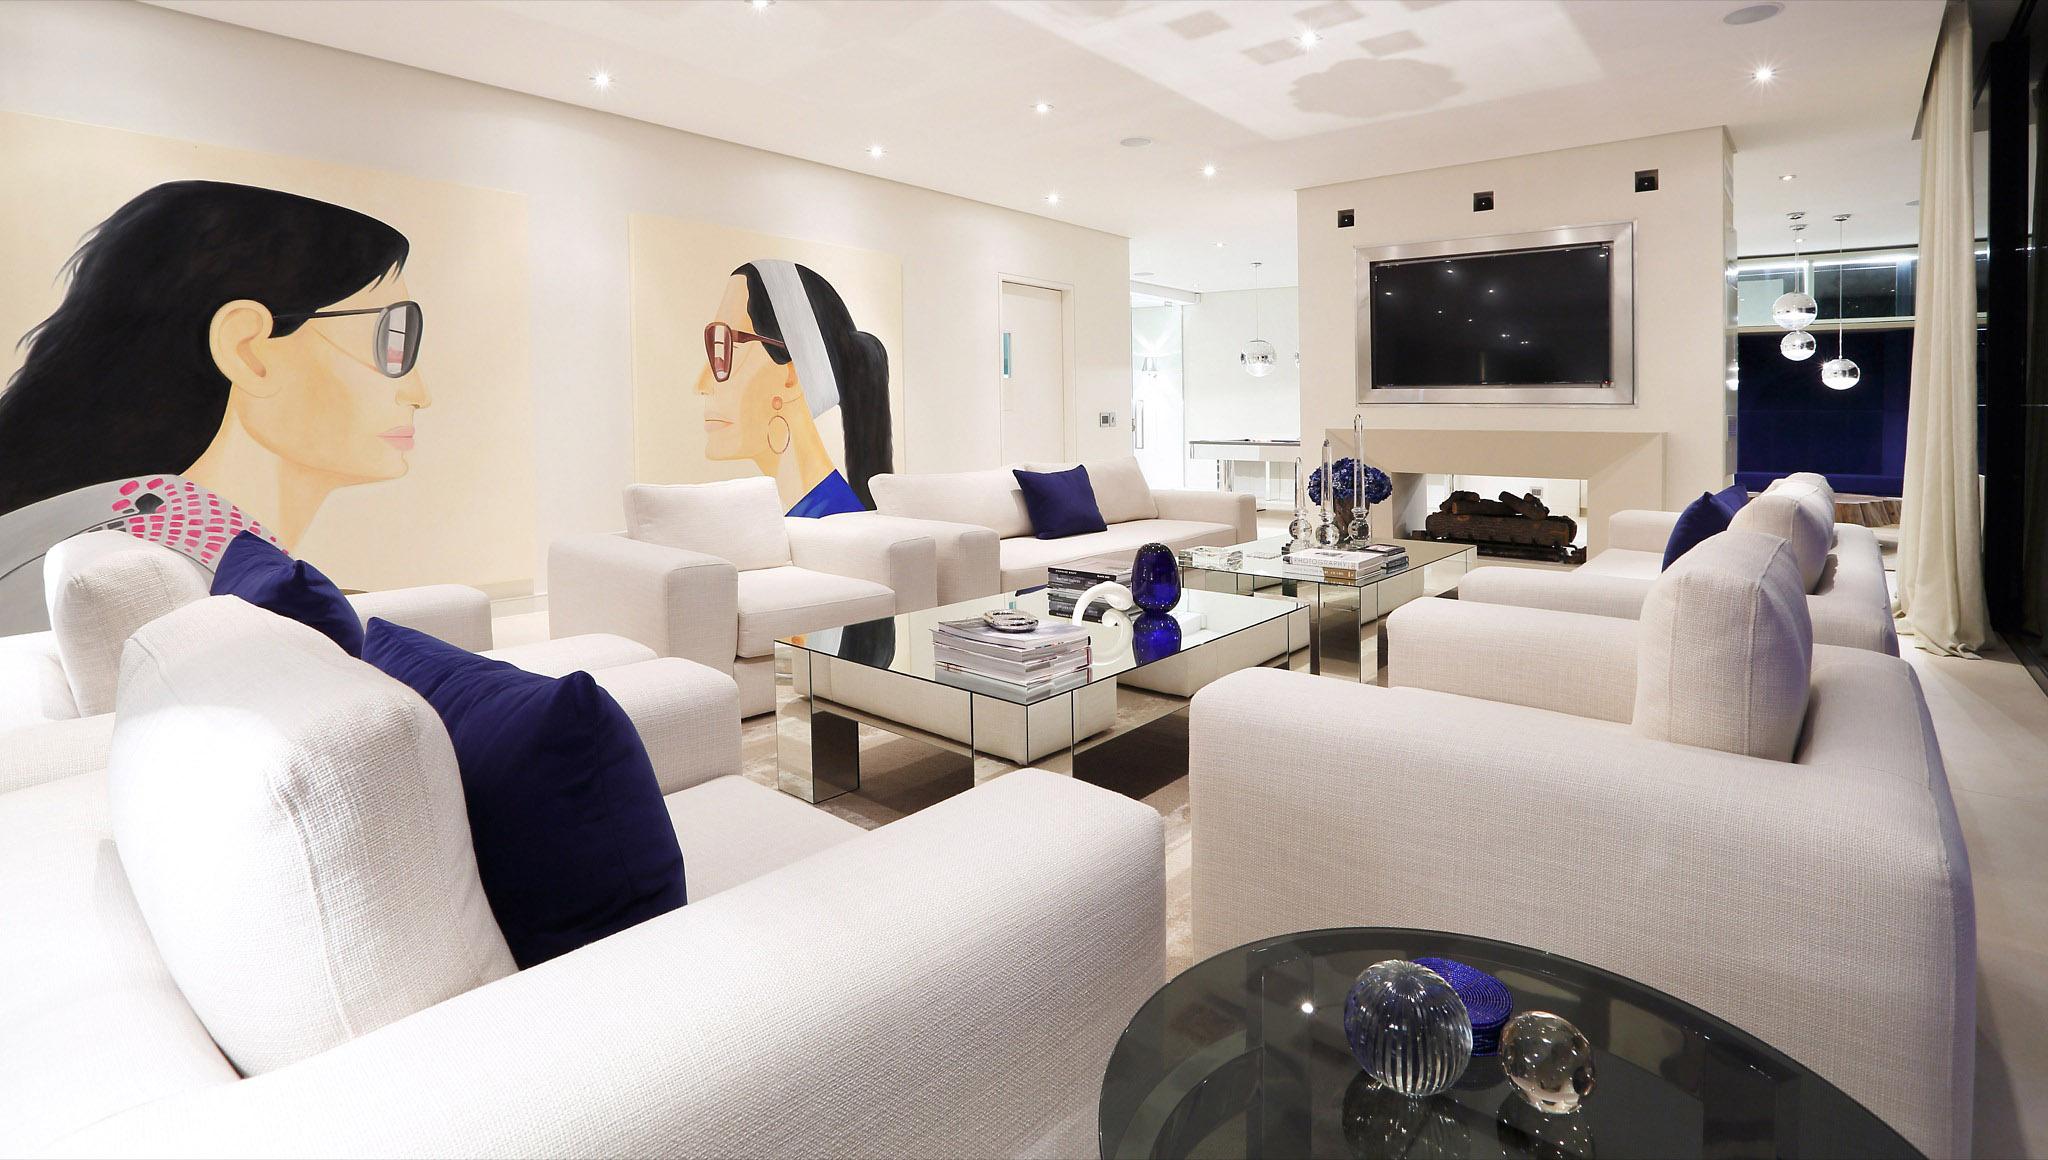 03 Lounge-8 2048.jpg